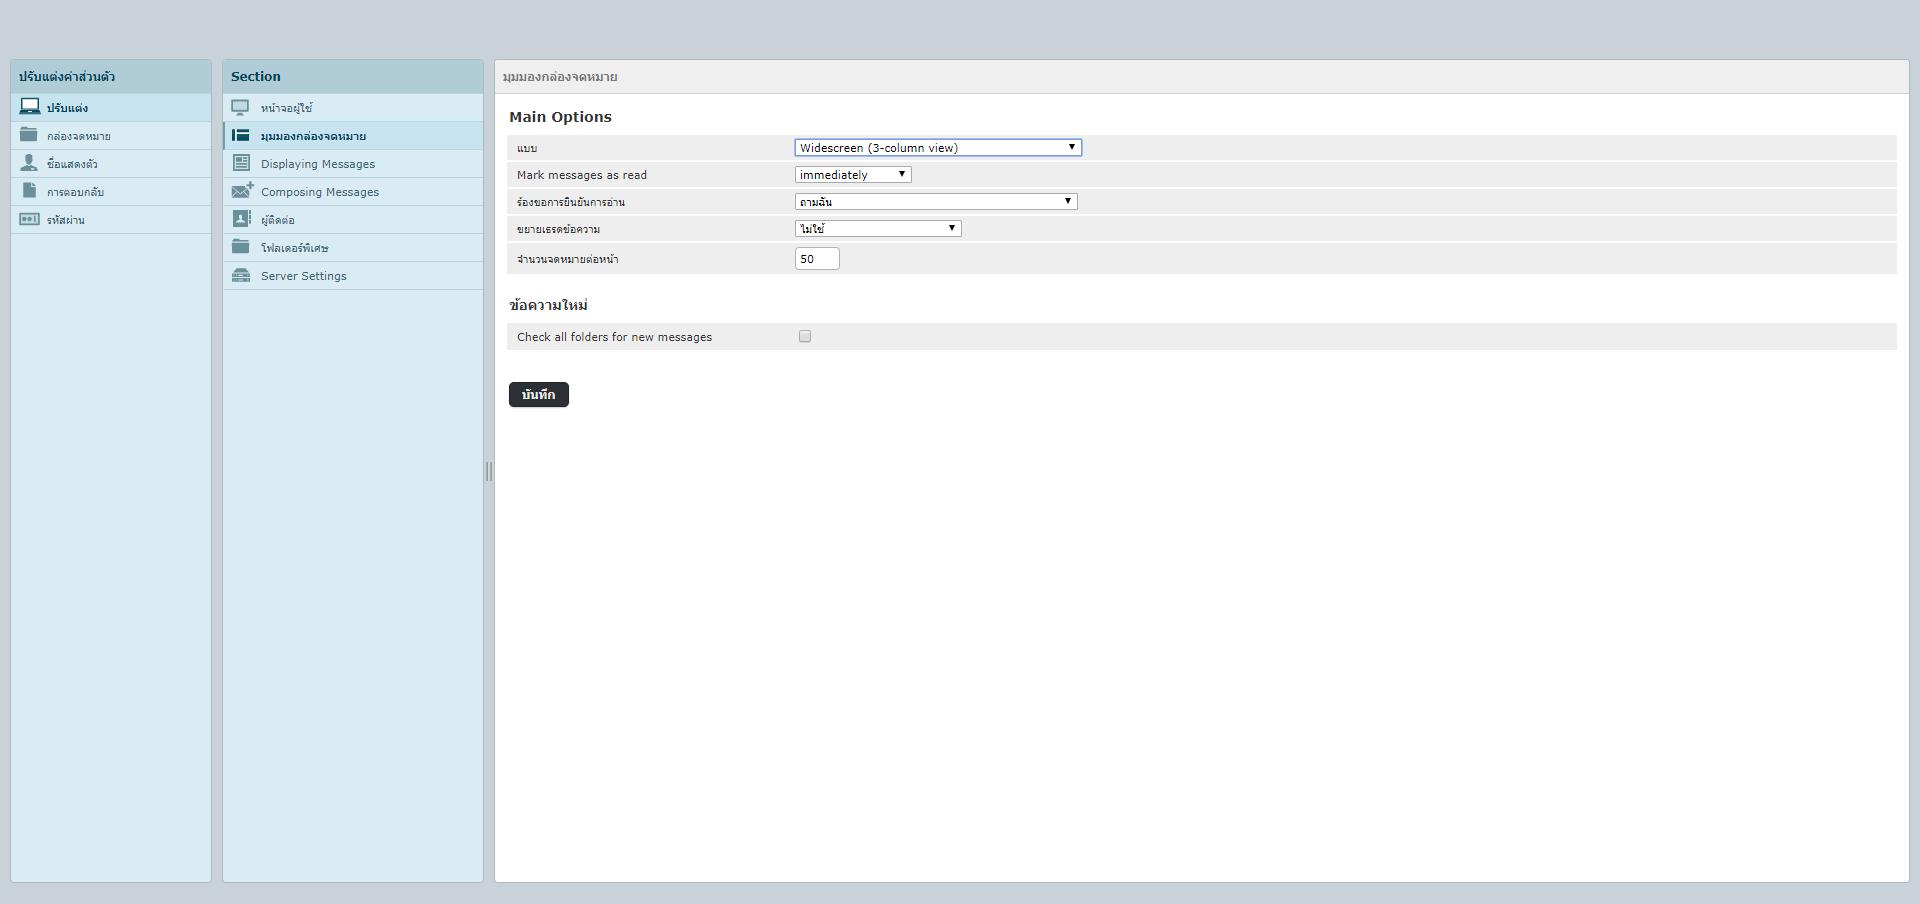 RC Mail (Business Email) Dashboard - ปรับแต่งมุมมองกล่องจดหมาย